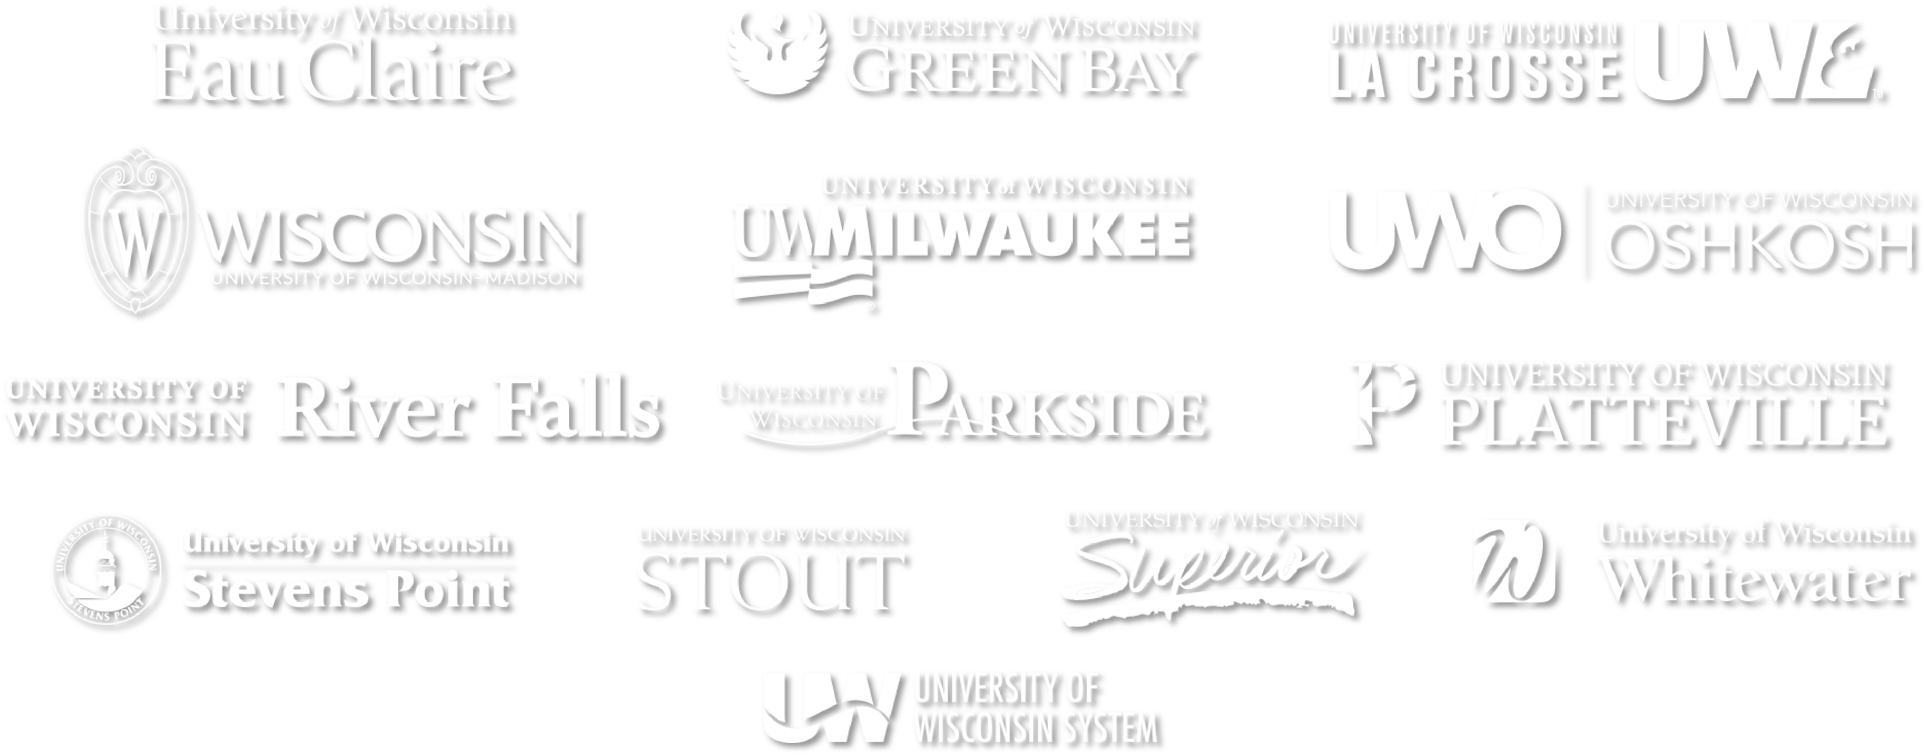 Image of all UW System schools